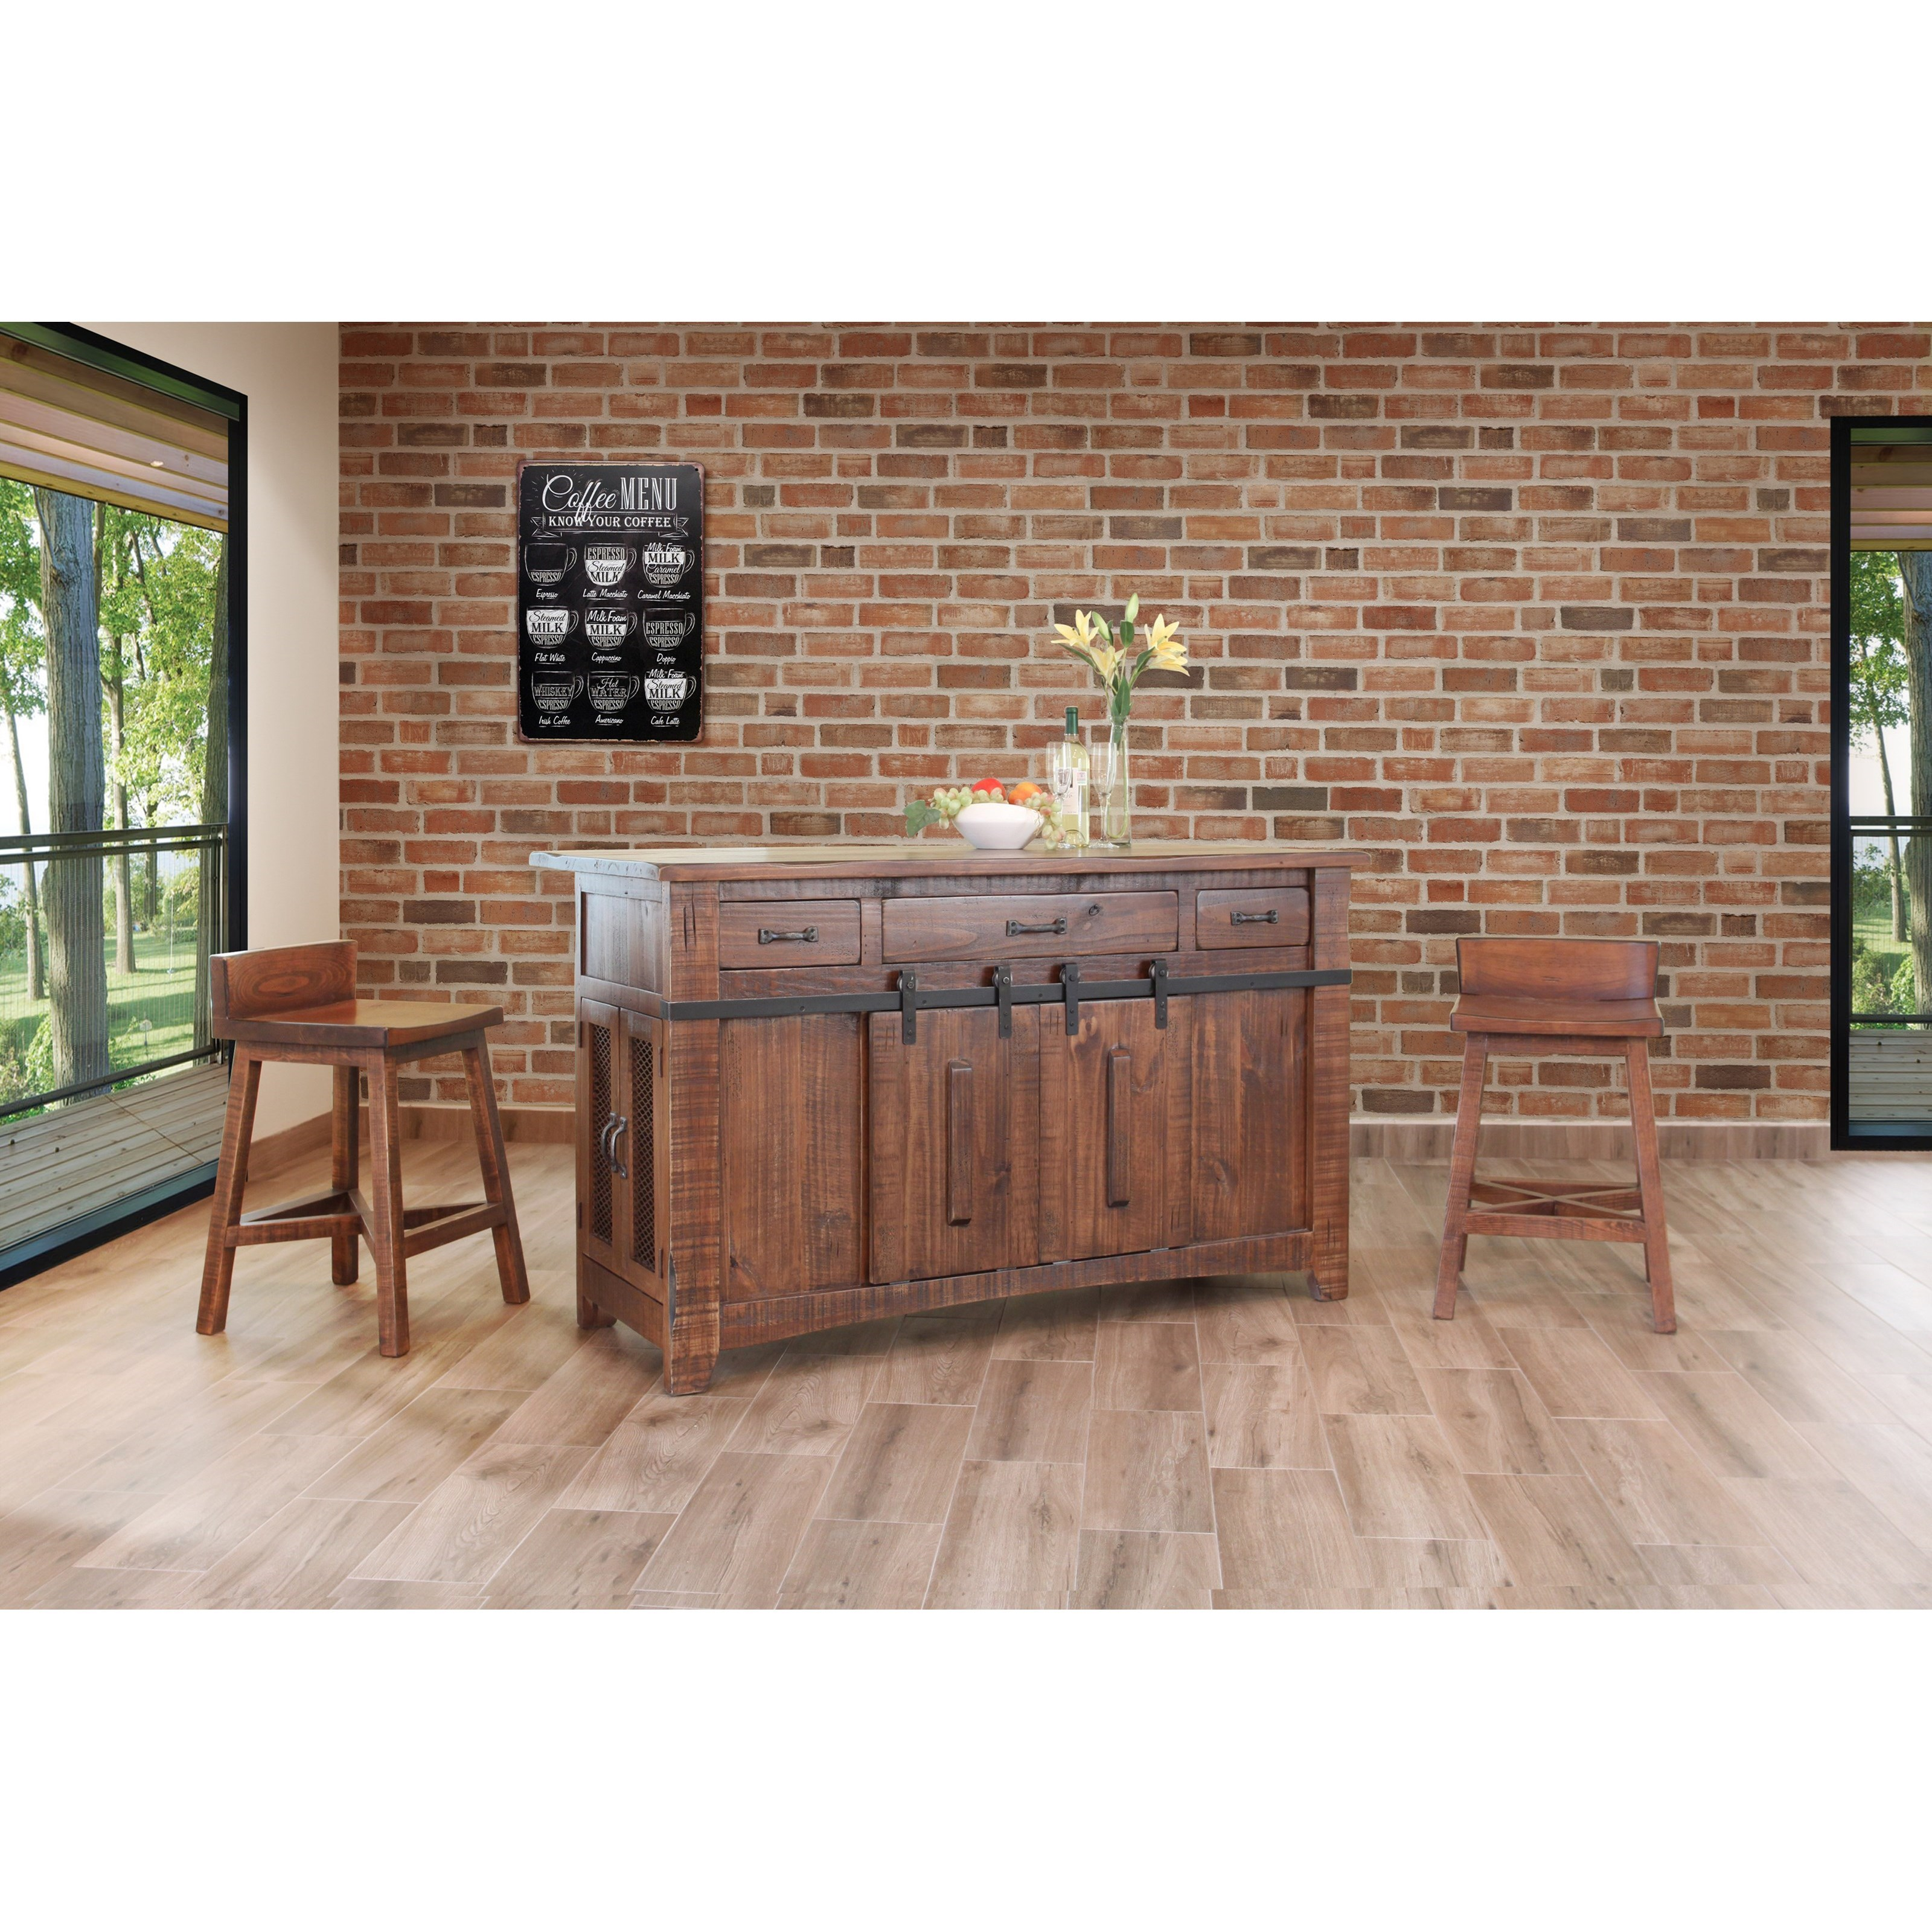 International Furniture Direct Pueblo Kitchen Island With Sliding Doors H L Stephens